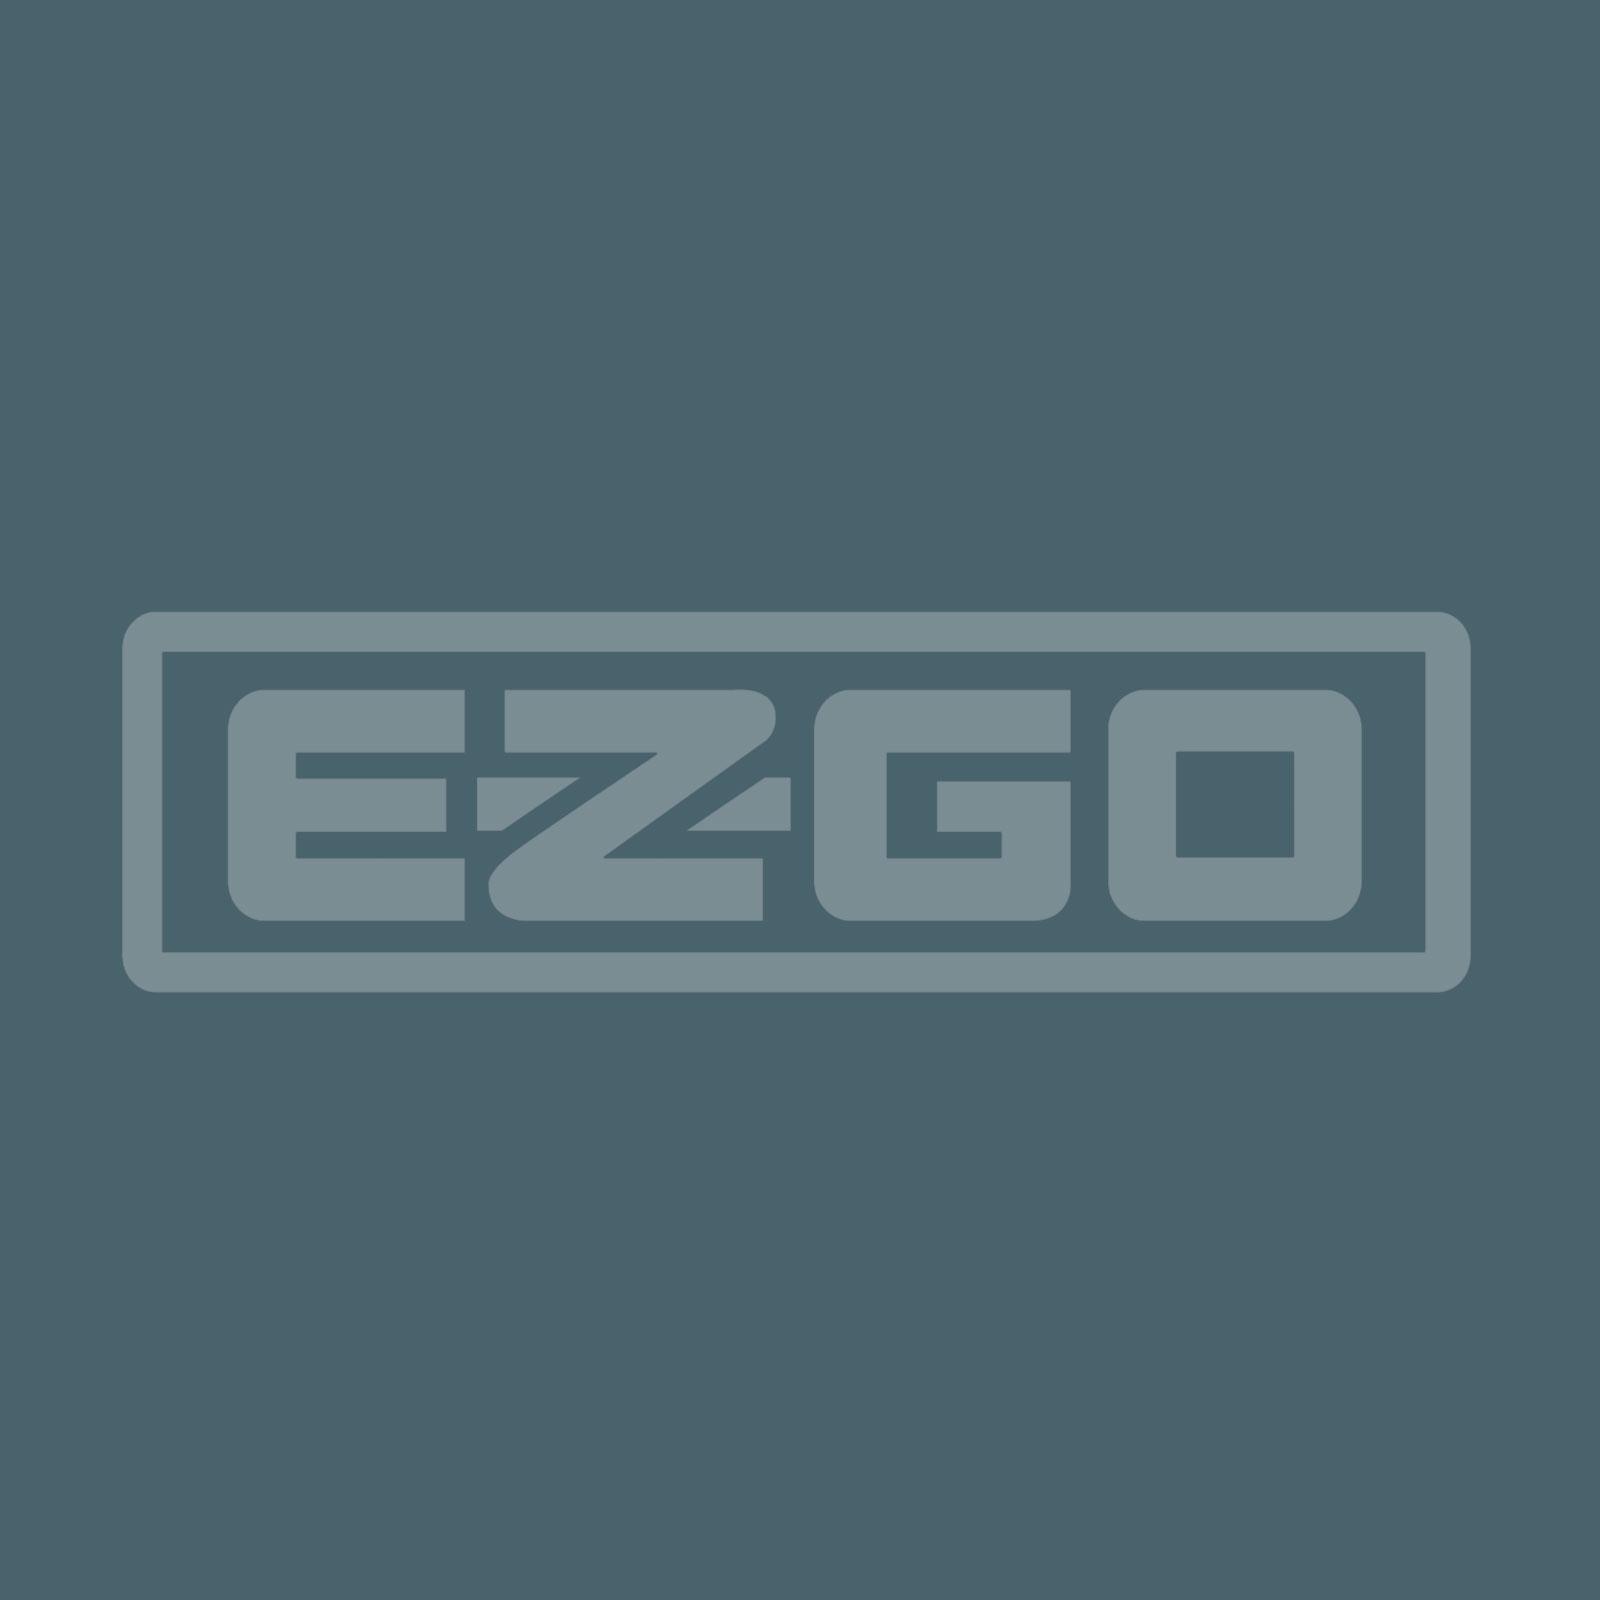 EZGO Steel Blue Placeholder